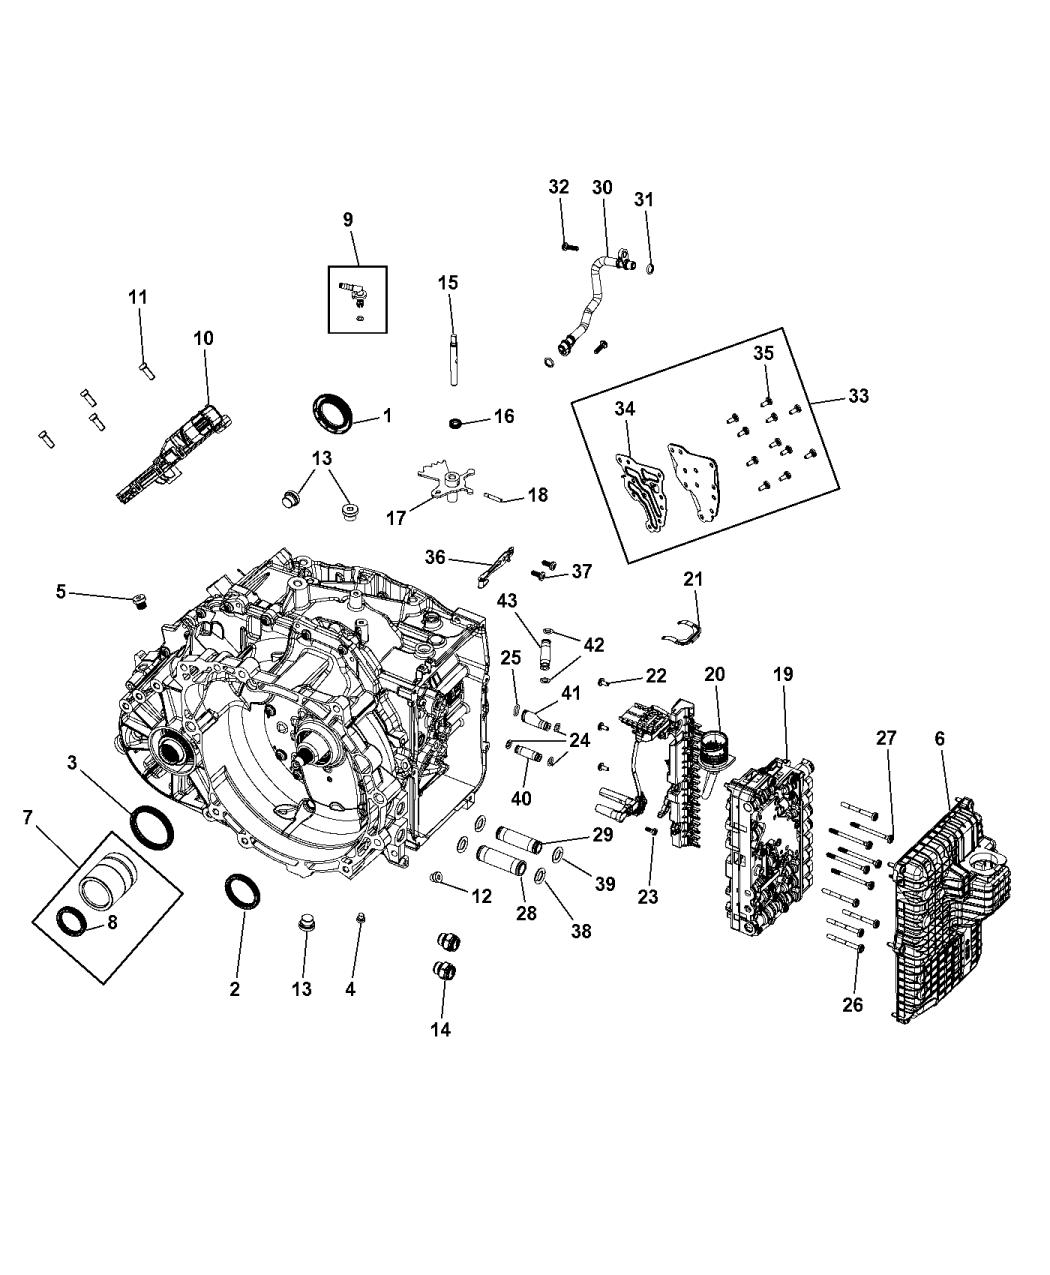 2015 jeep renegade transmission serviceable parts